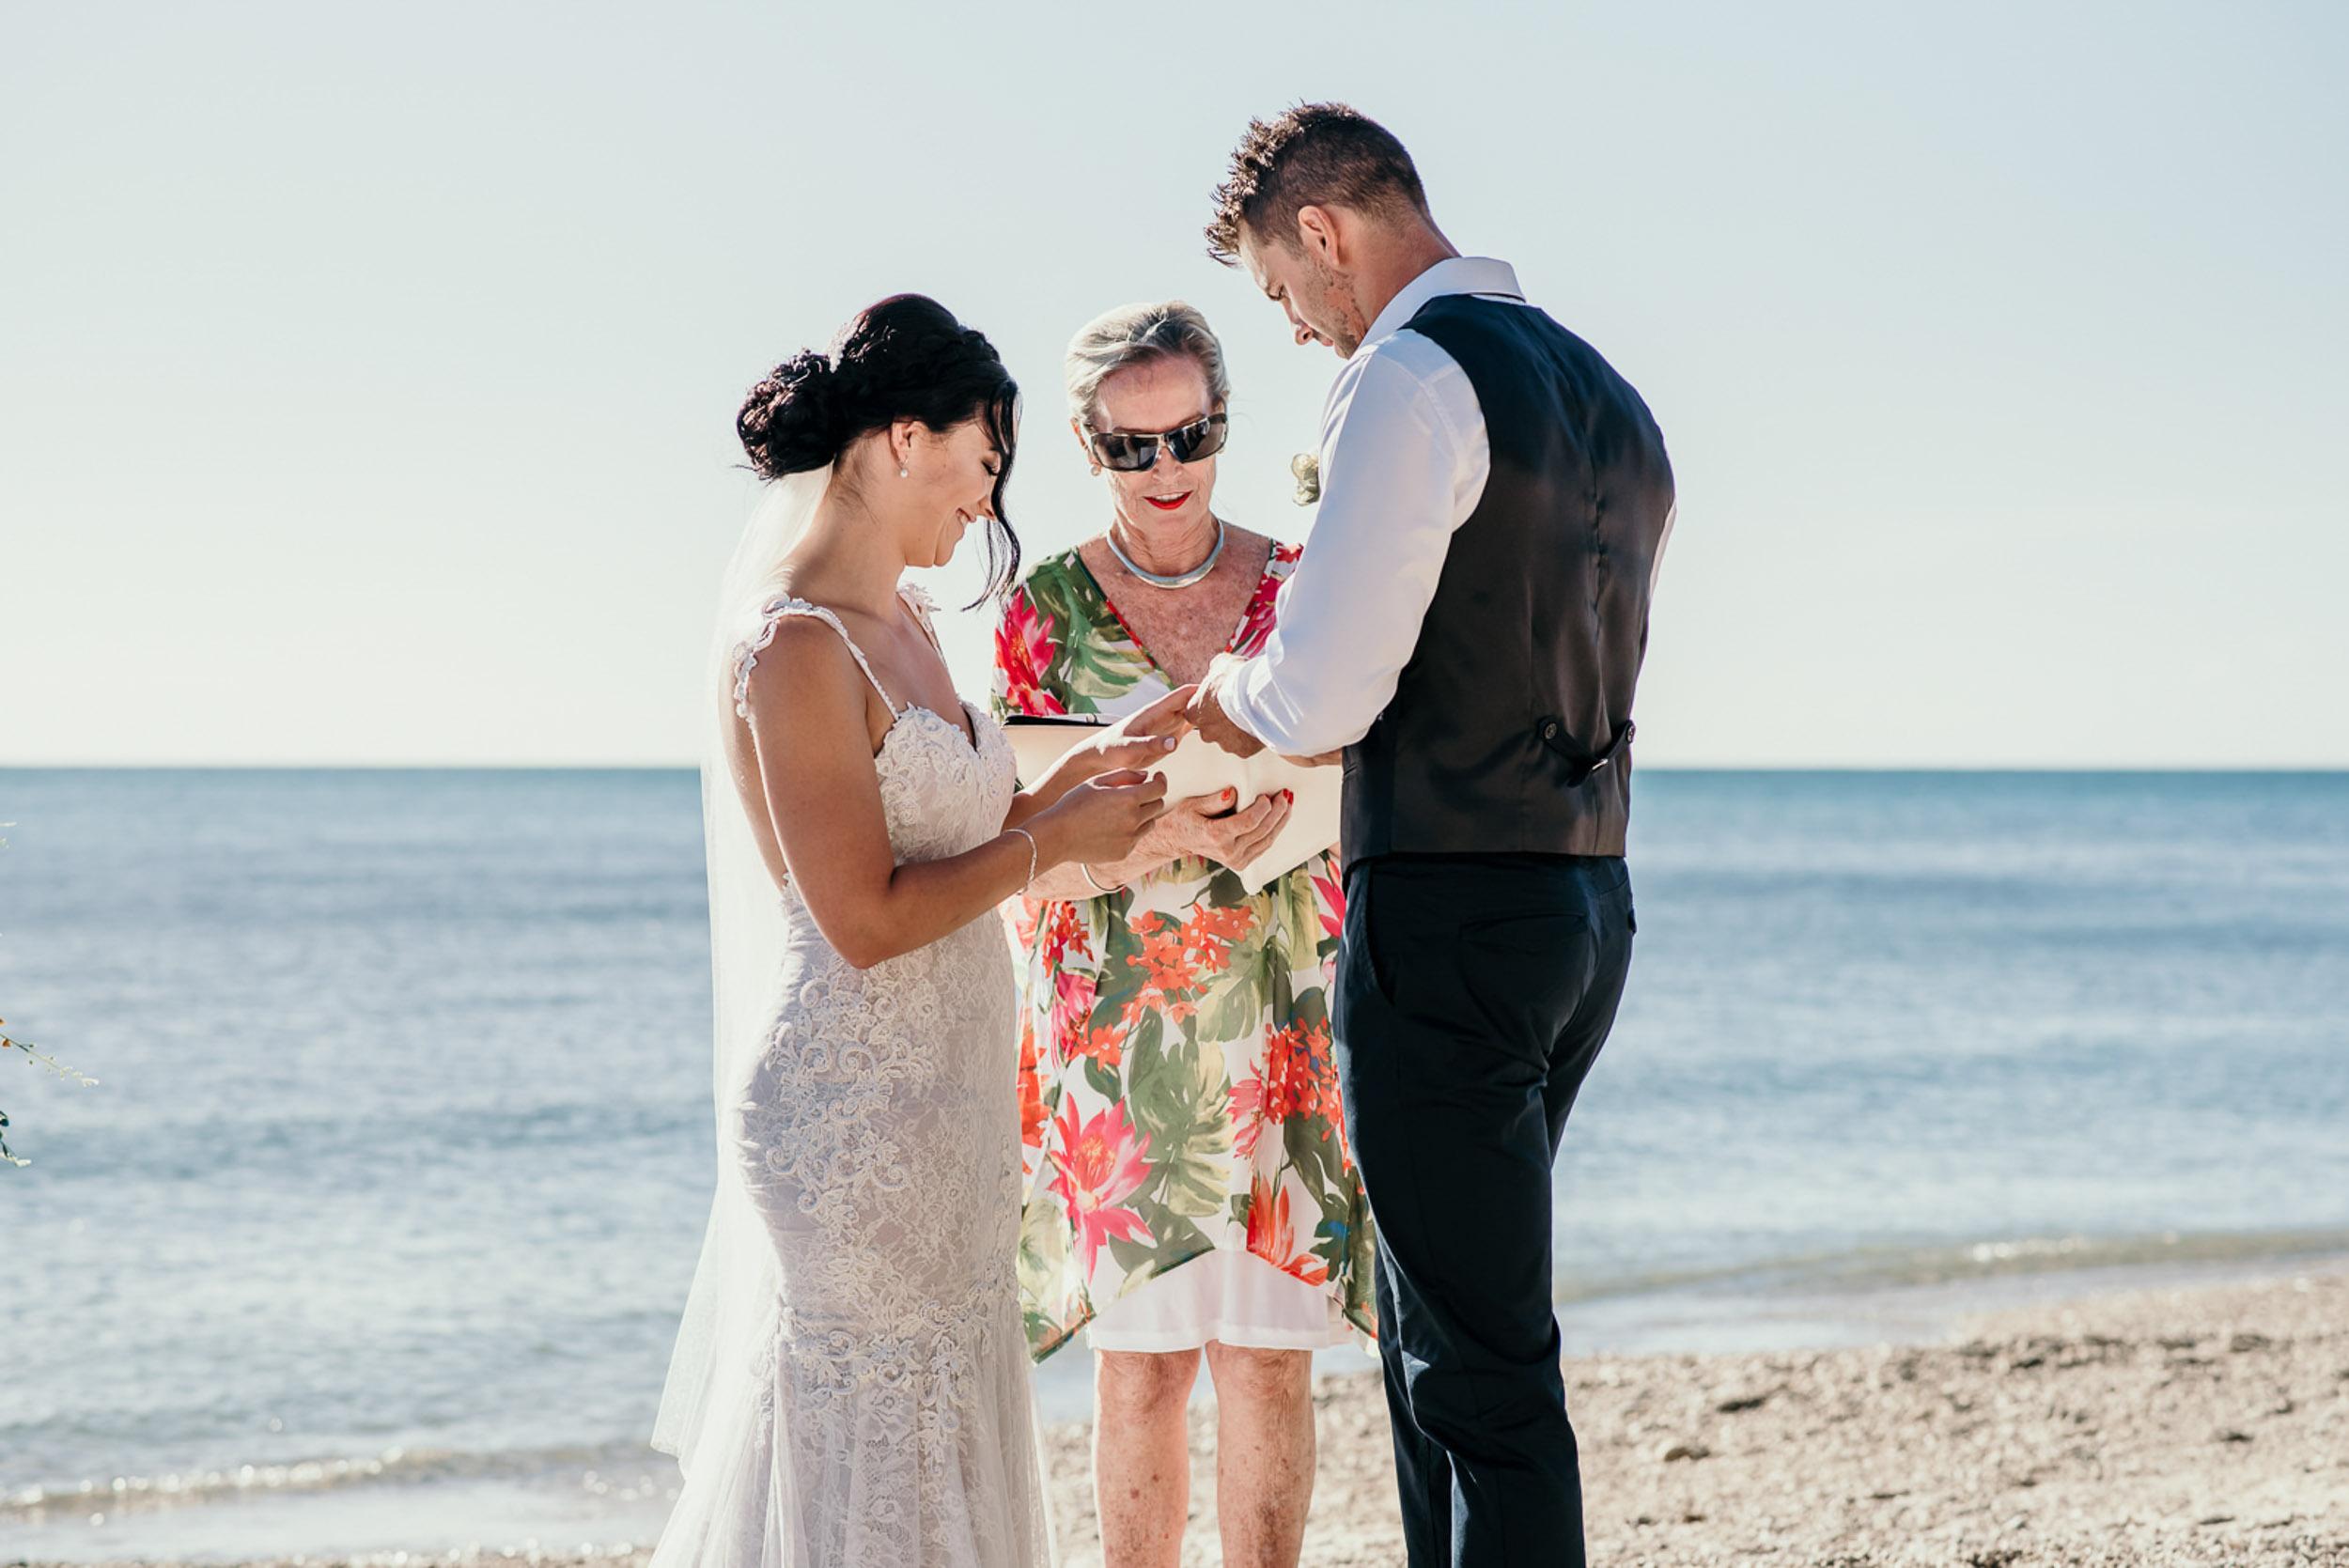 The Raw Photographer - Cairns Wedding Photographer - Fitzroy Island - Destination Wedding - Bride Dress - Groom Portrait - Queensland-23.jpg